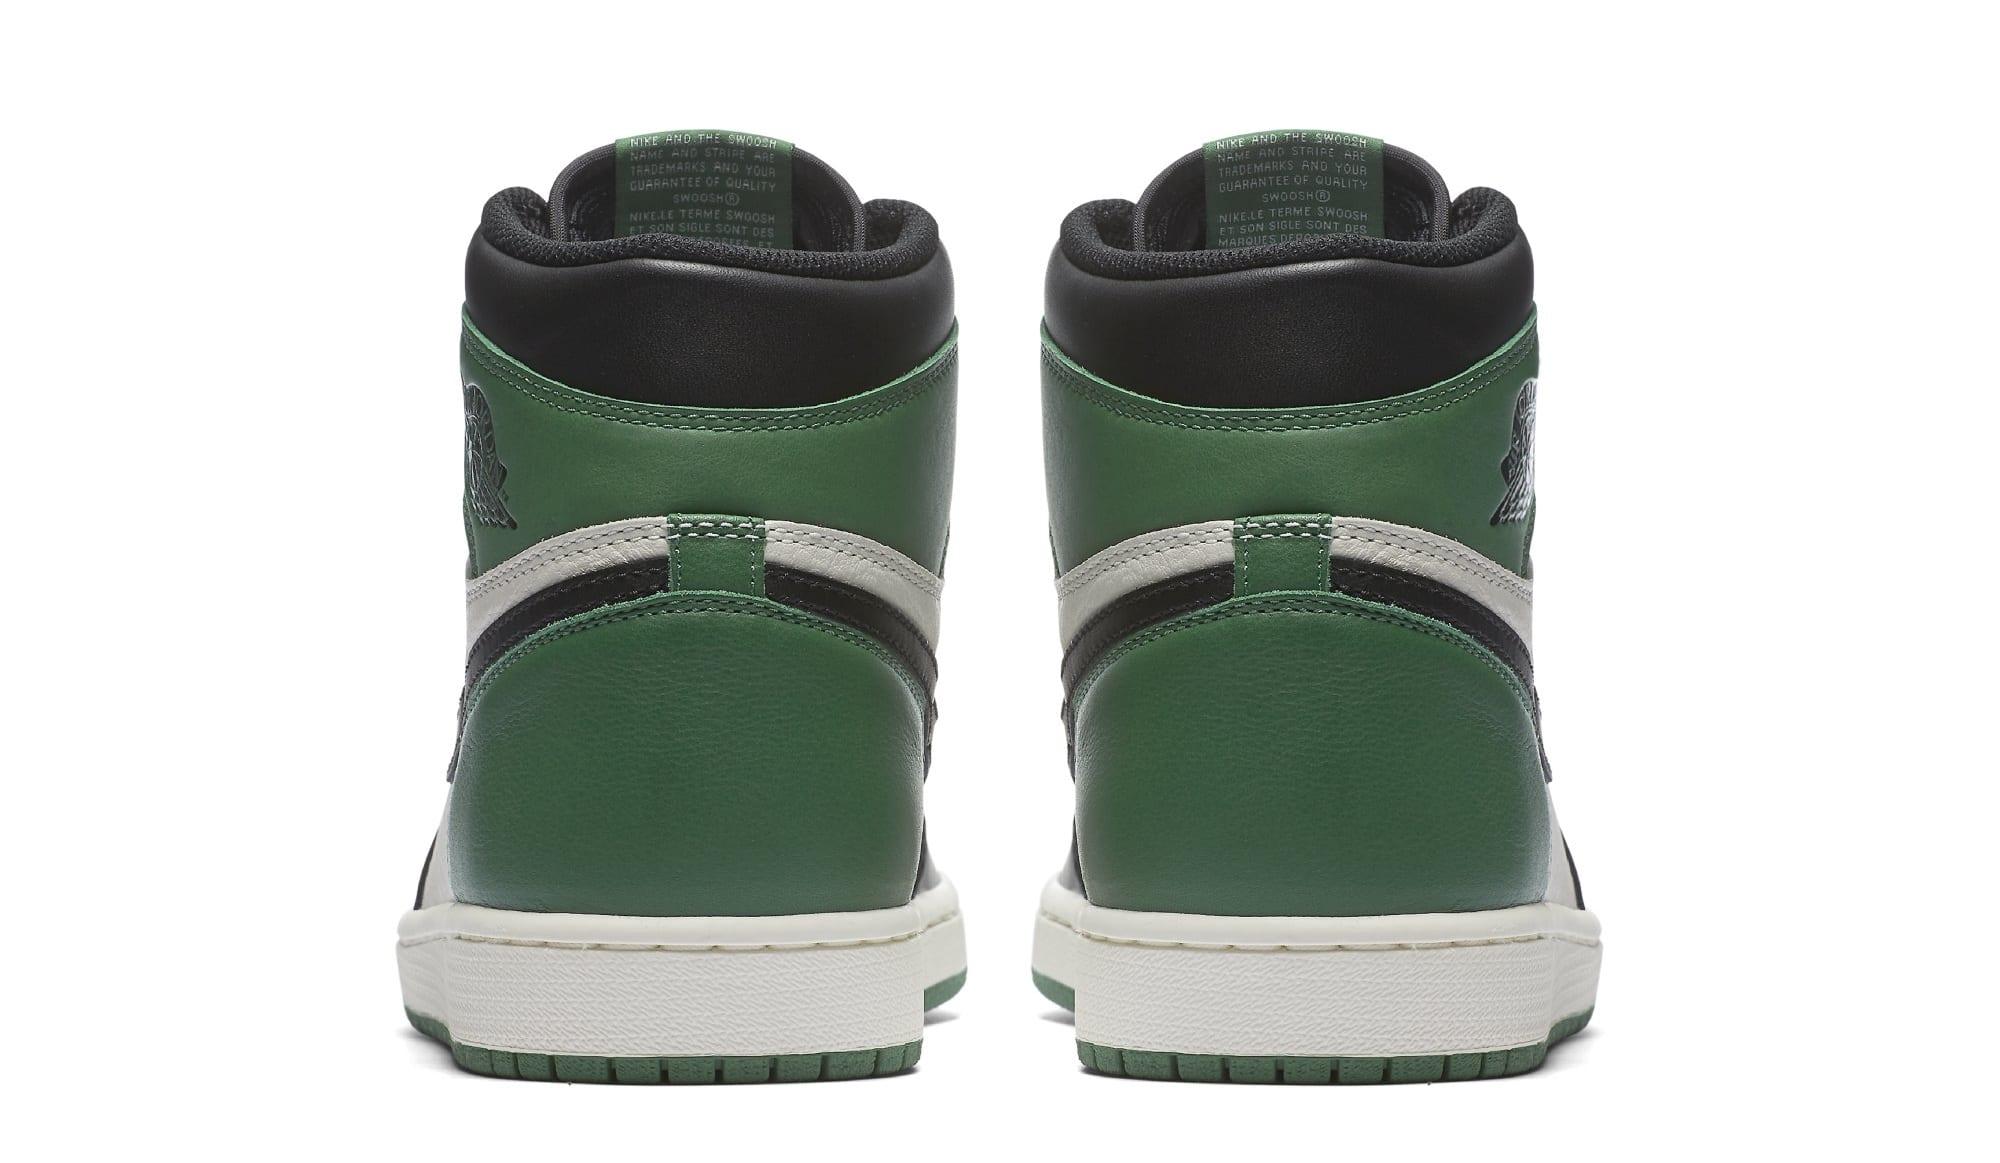 Air Jordan 1 High OG 'Pine Green' 555088-032 (Heel)